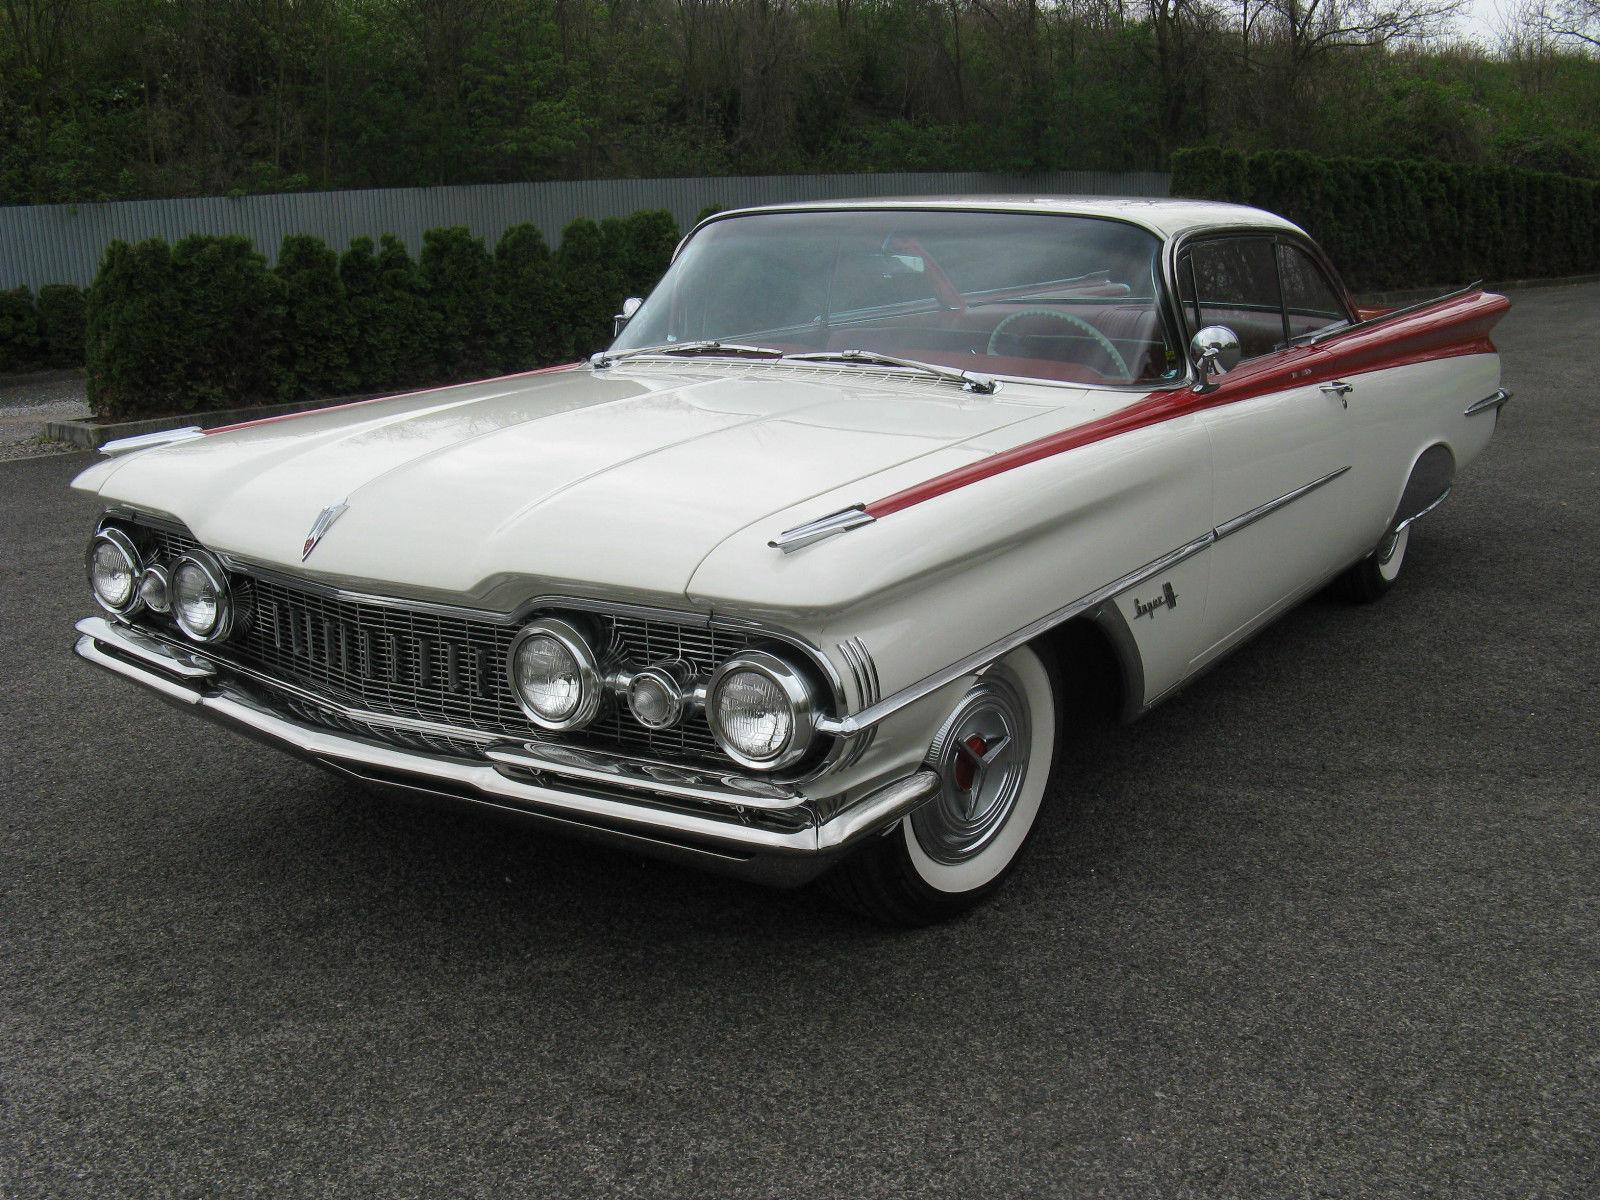 All American Classic Cars 1959 Oldsmobile Super 88 2 Door Hardtop Scenicoupe